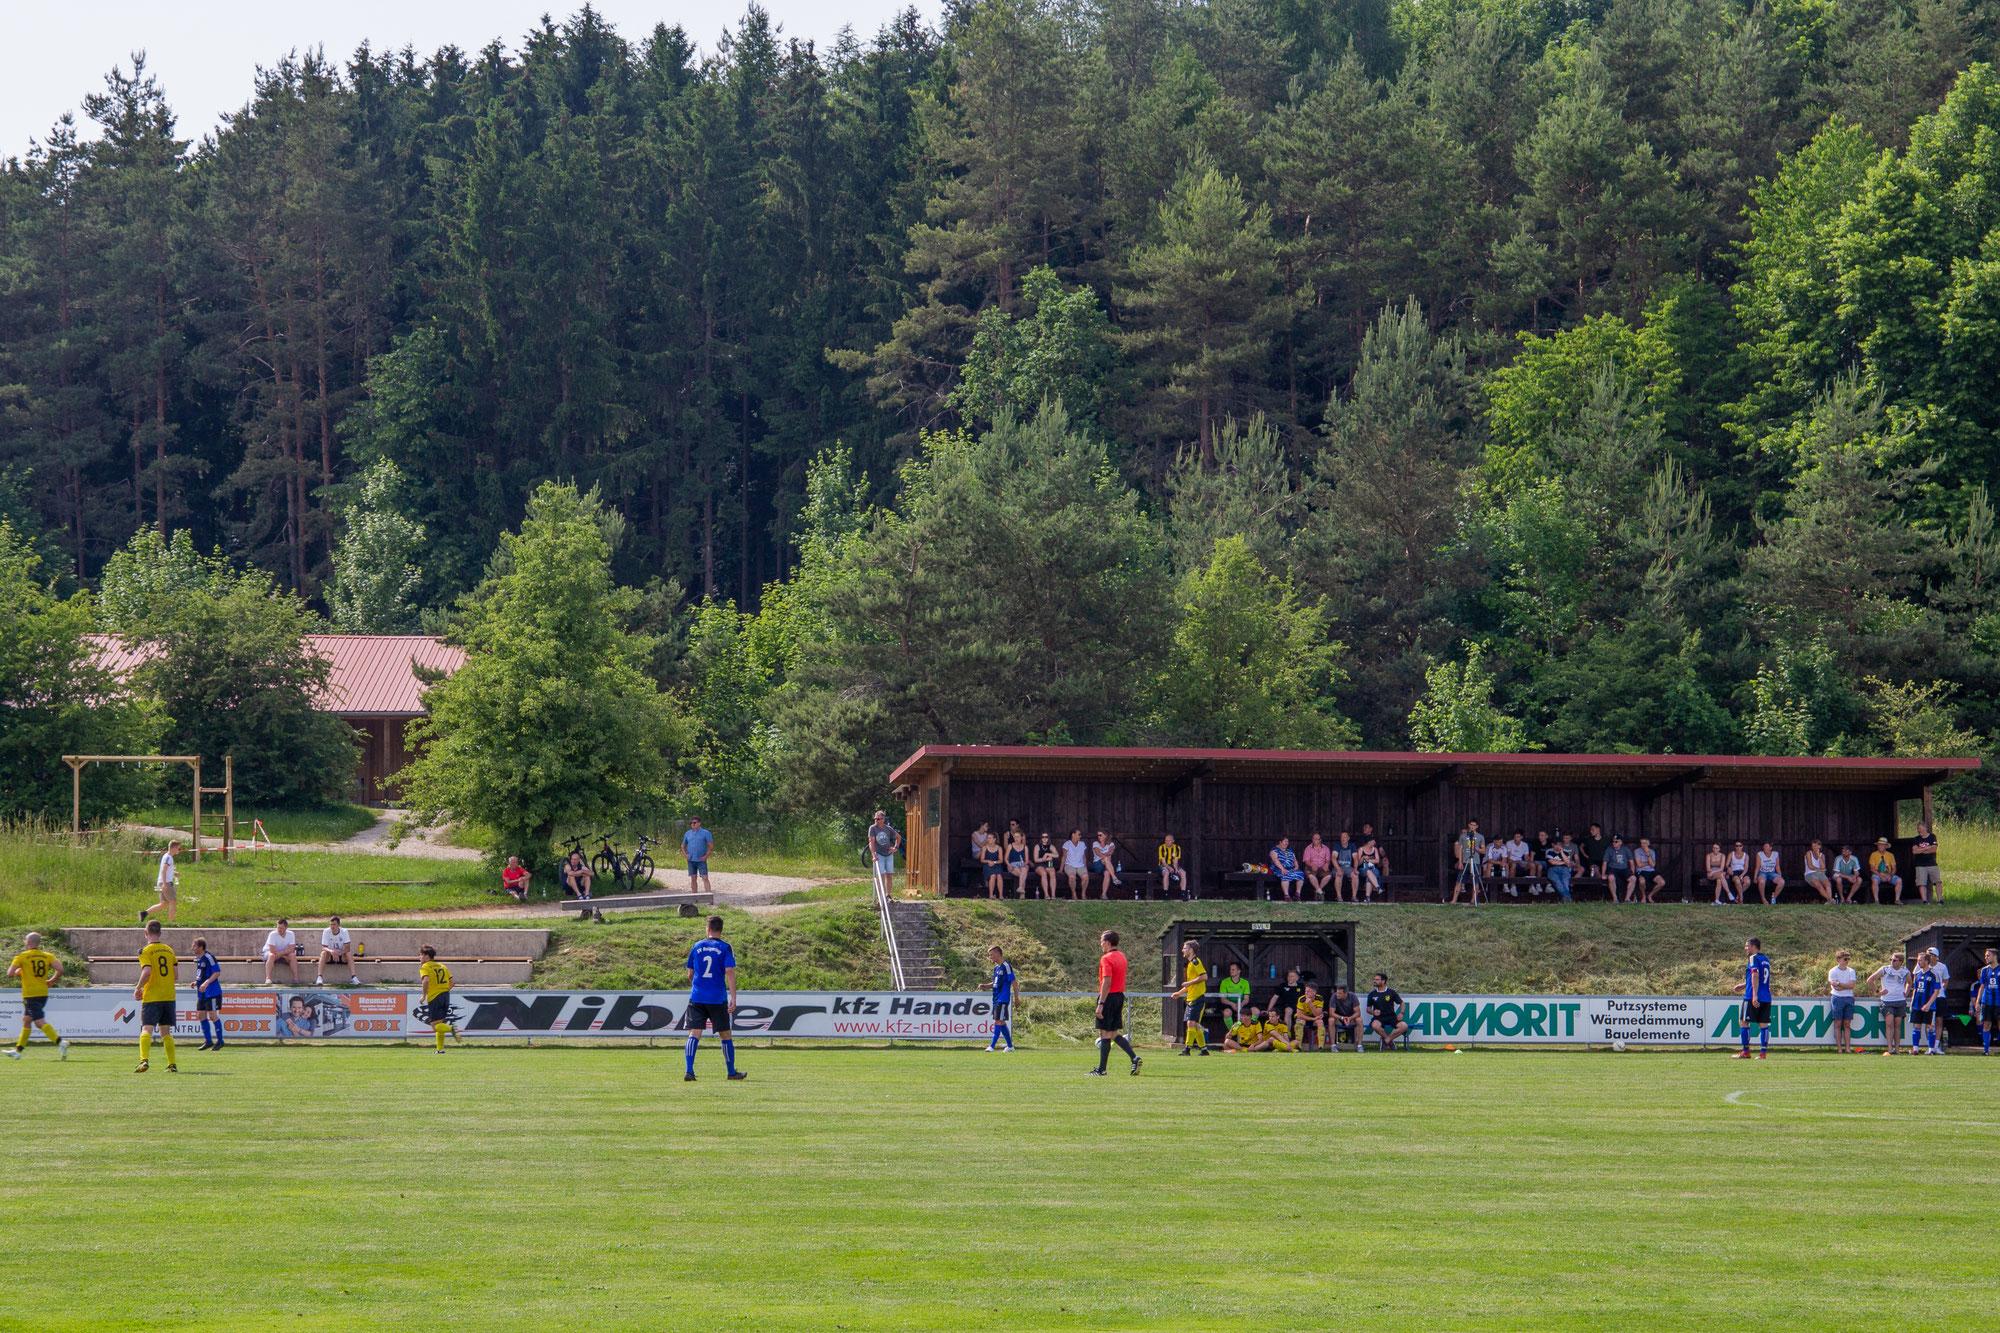 Groundhopping: SV Lauterhofen vs. SV Raigering